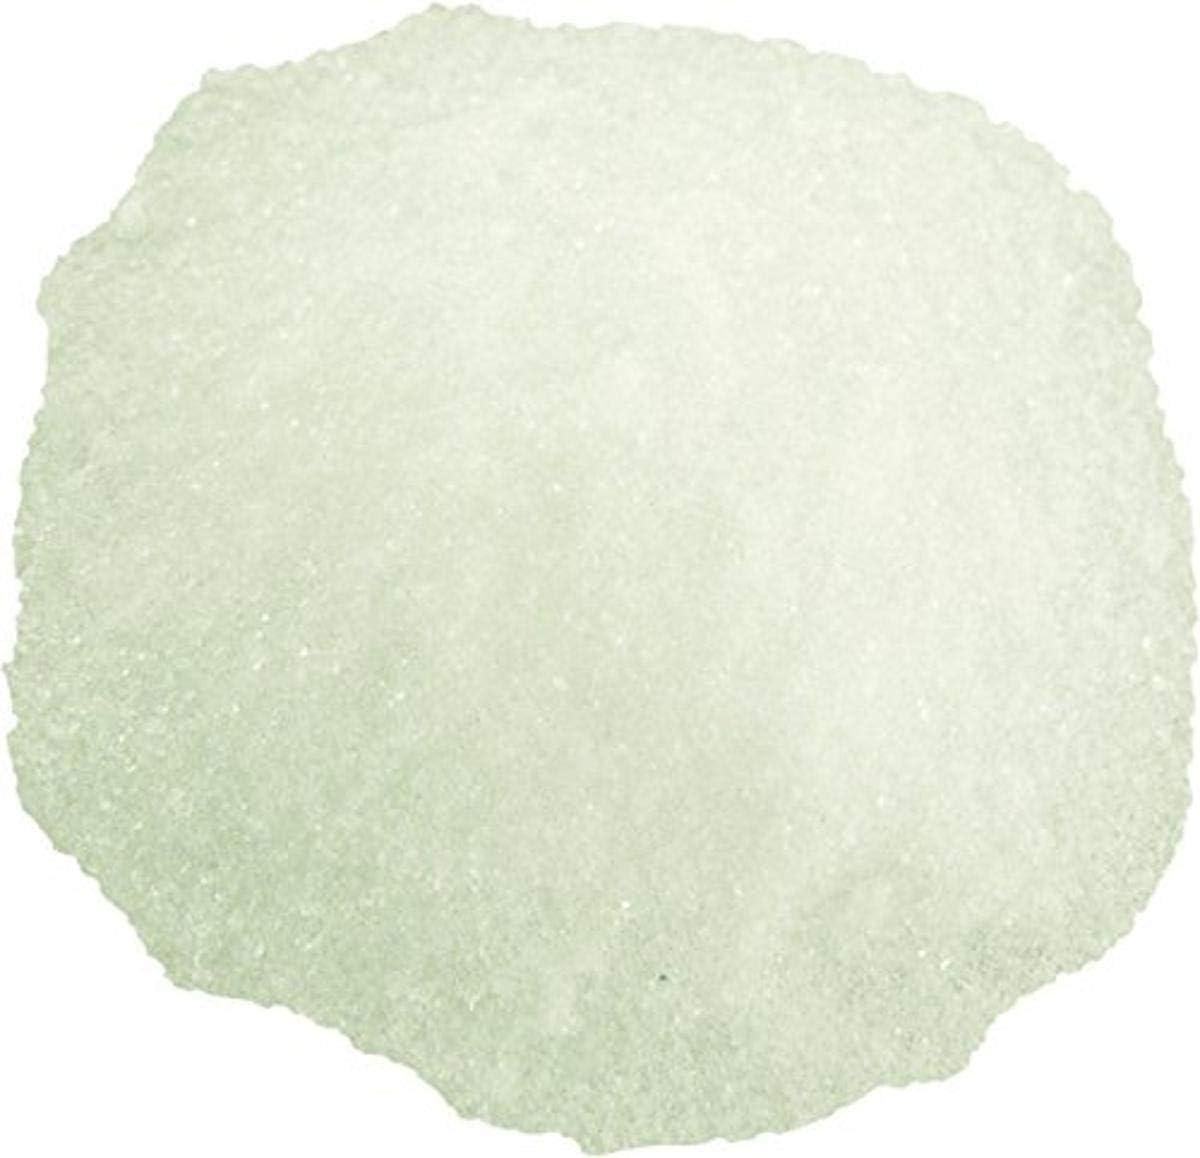 CellarScience - AD330LB Yeast Nutrient (DAP) (1 lb)